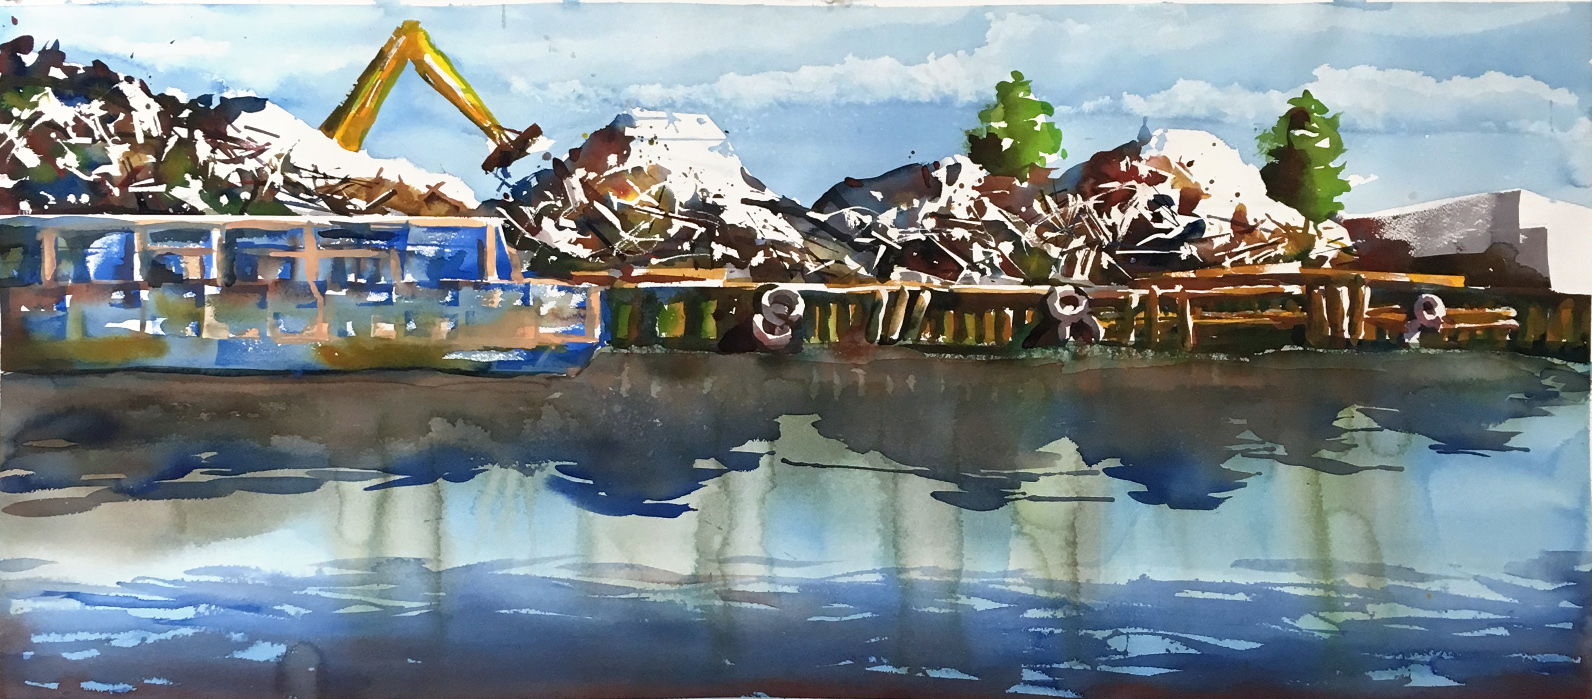 Scrap-Yard-and-Barge (1).jpg